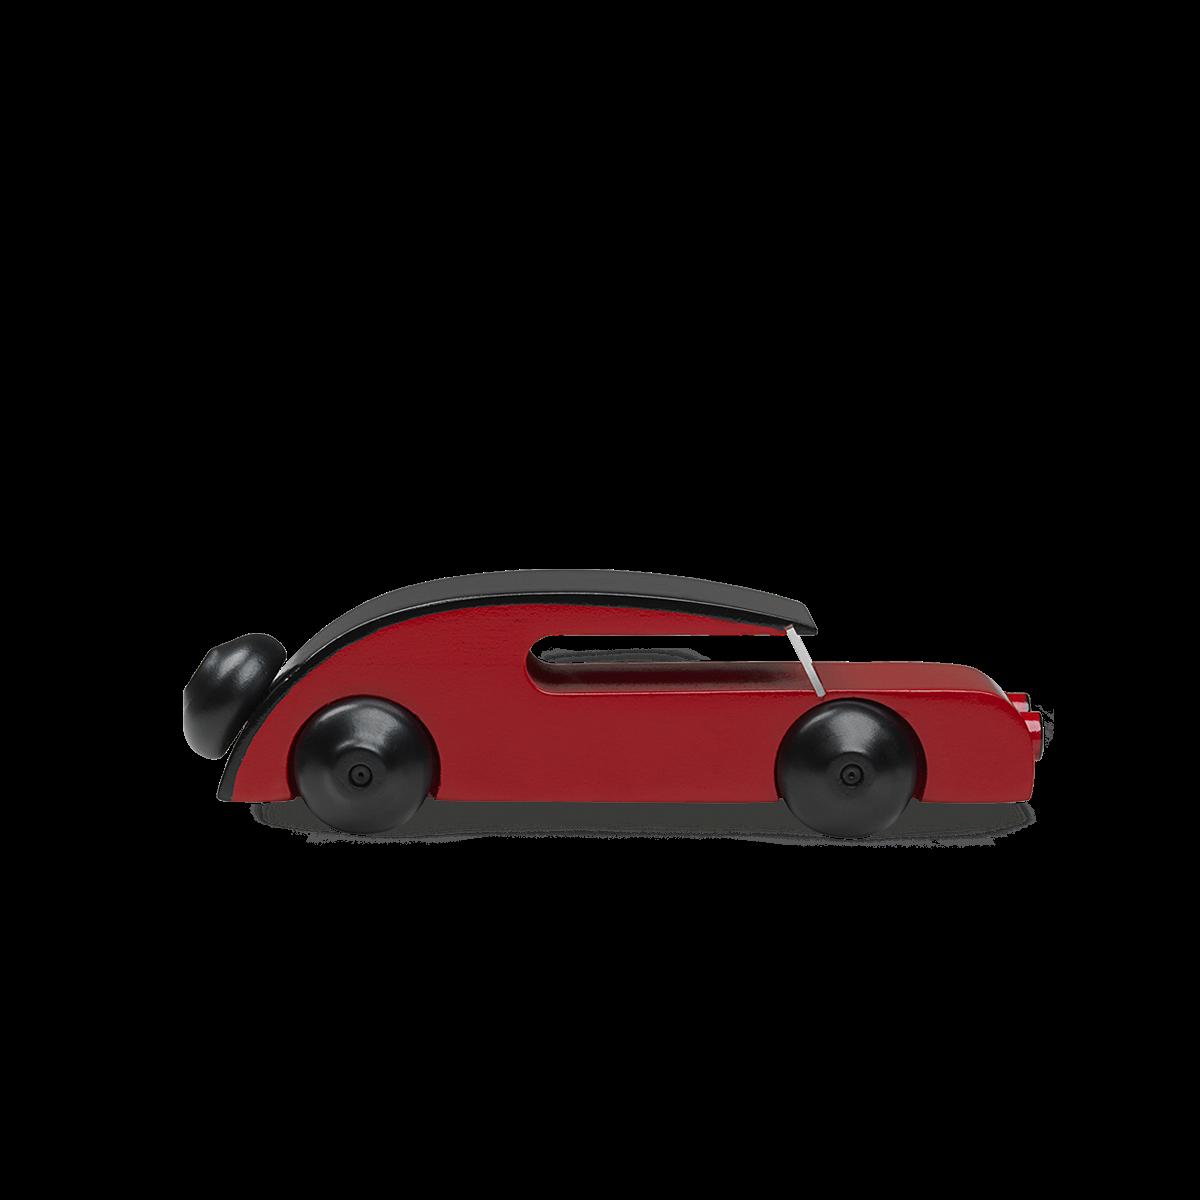 Kay Bojesen - Automobil Small (39216)